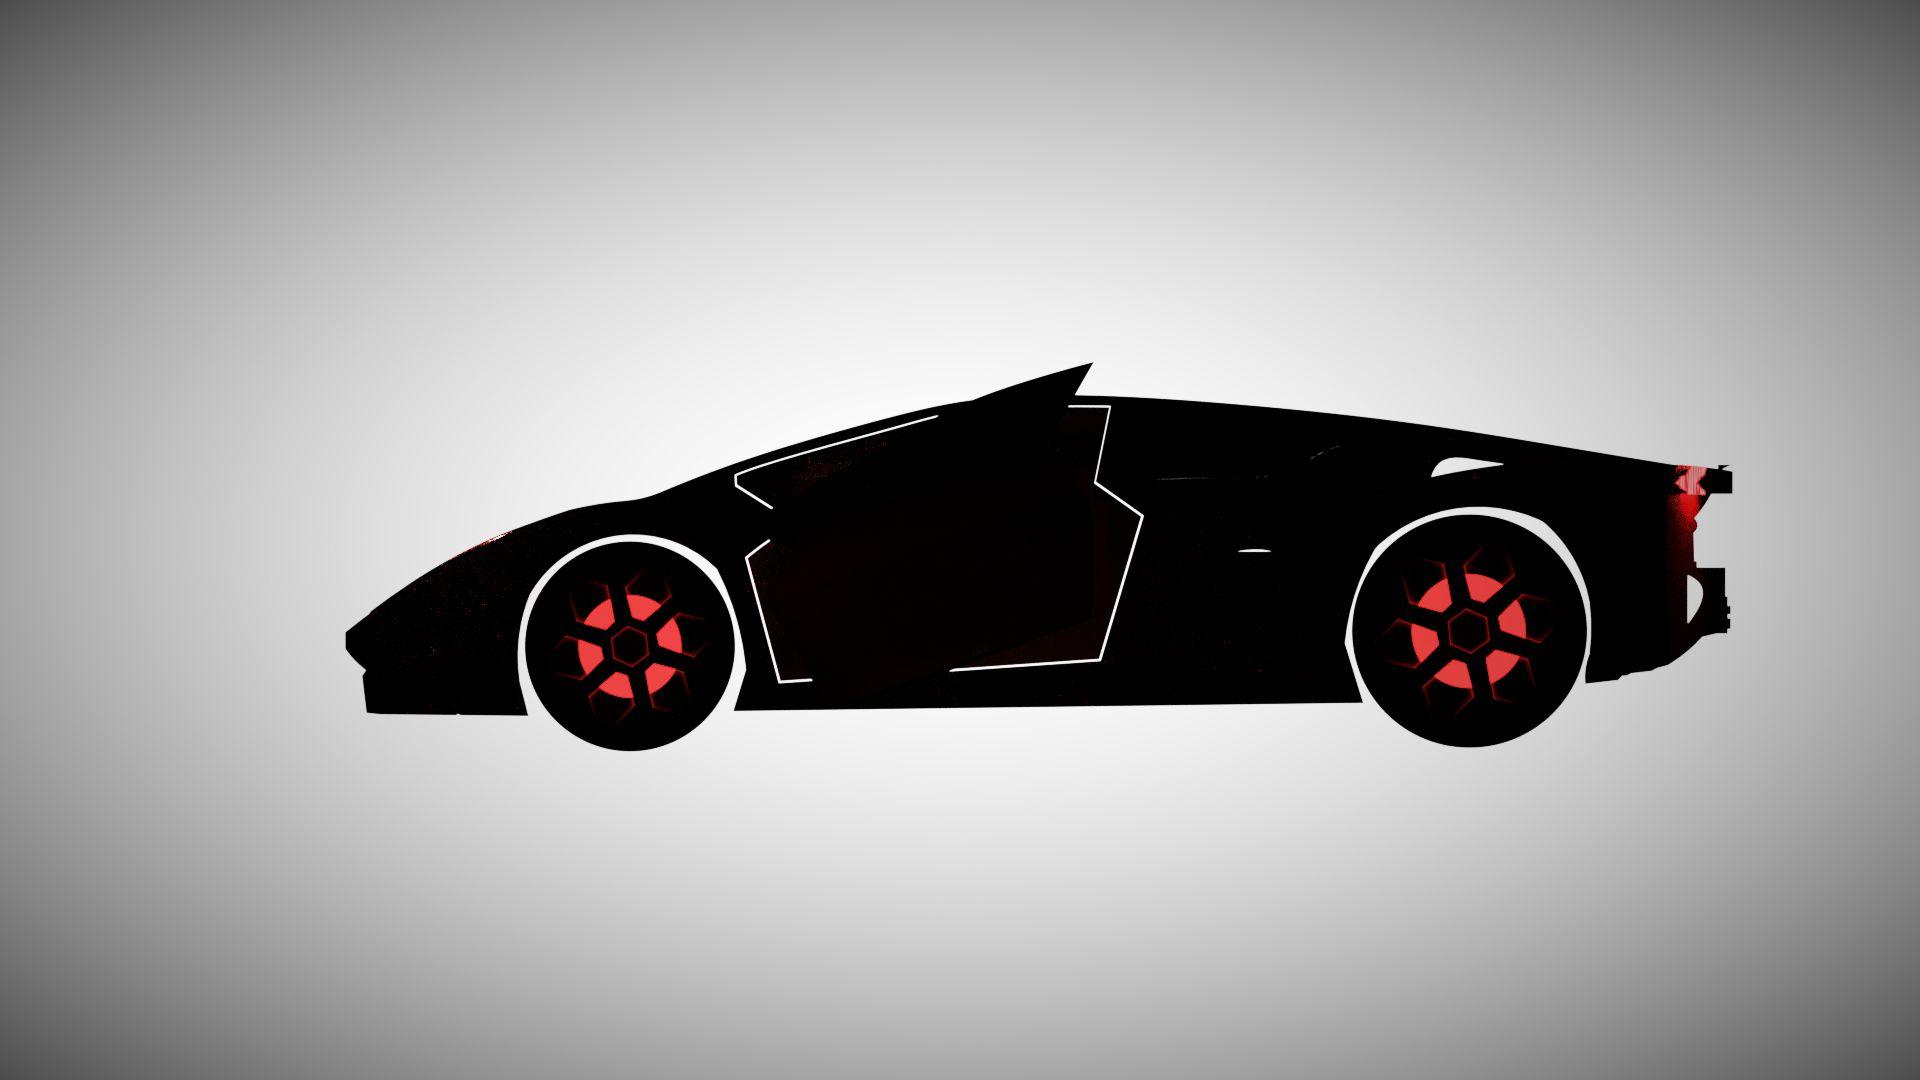 Lamborghini-2016-aug-21-10-35-52am-000-customizedview4284740814-2-3500-3500